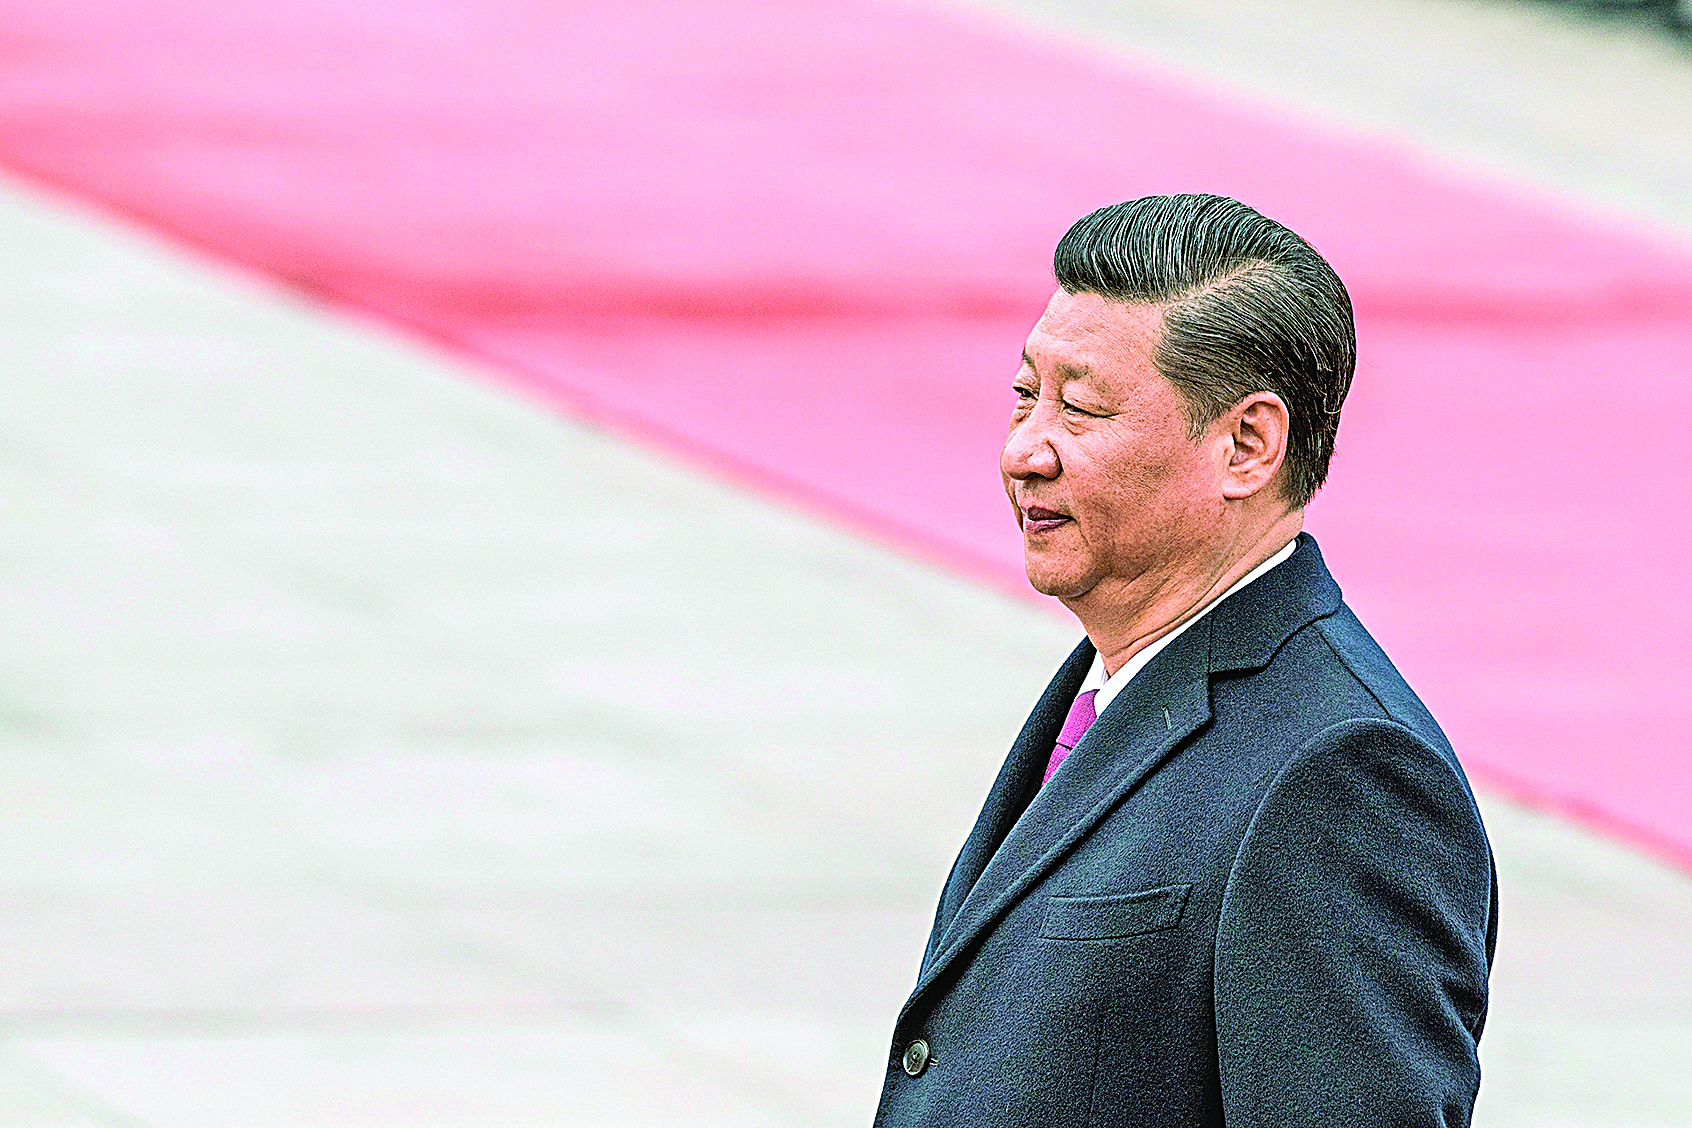 中共近日宣佈將修憲取消國家主席任期。(FRED DUFOUR/AFP/Getty Images)